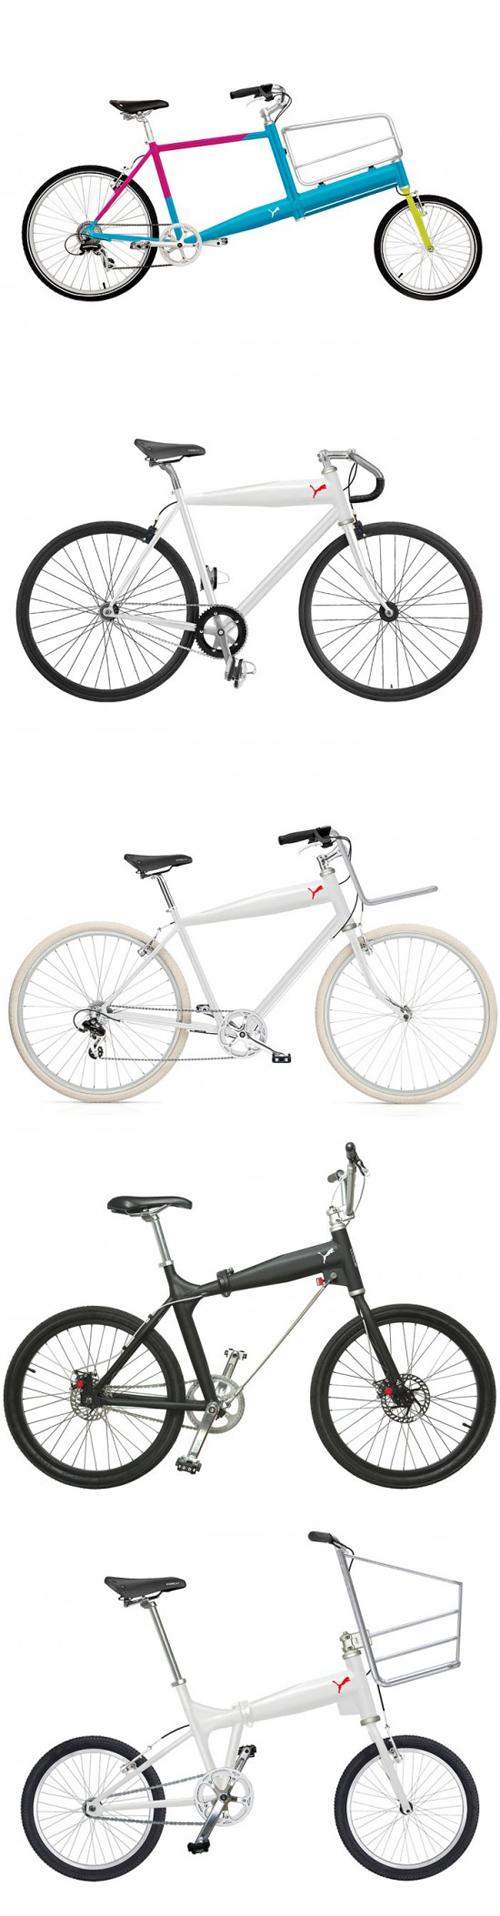 Le Puma Urban Bike